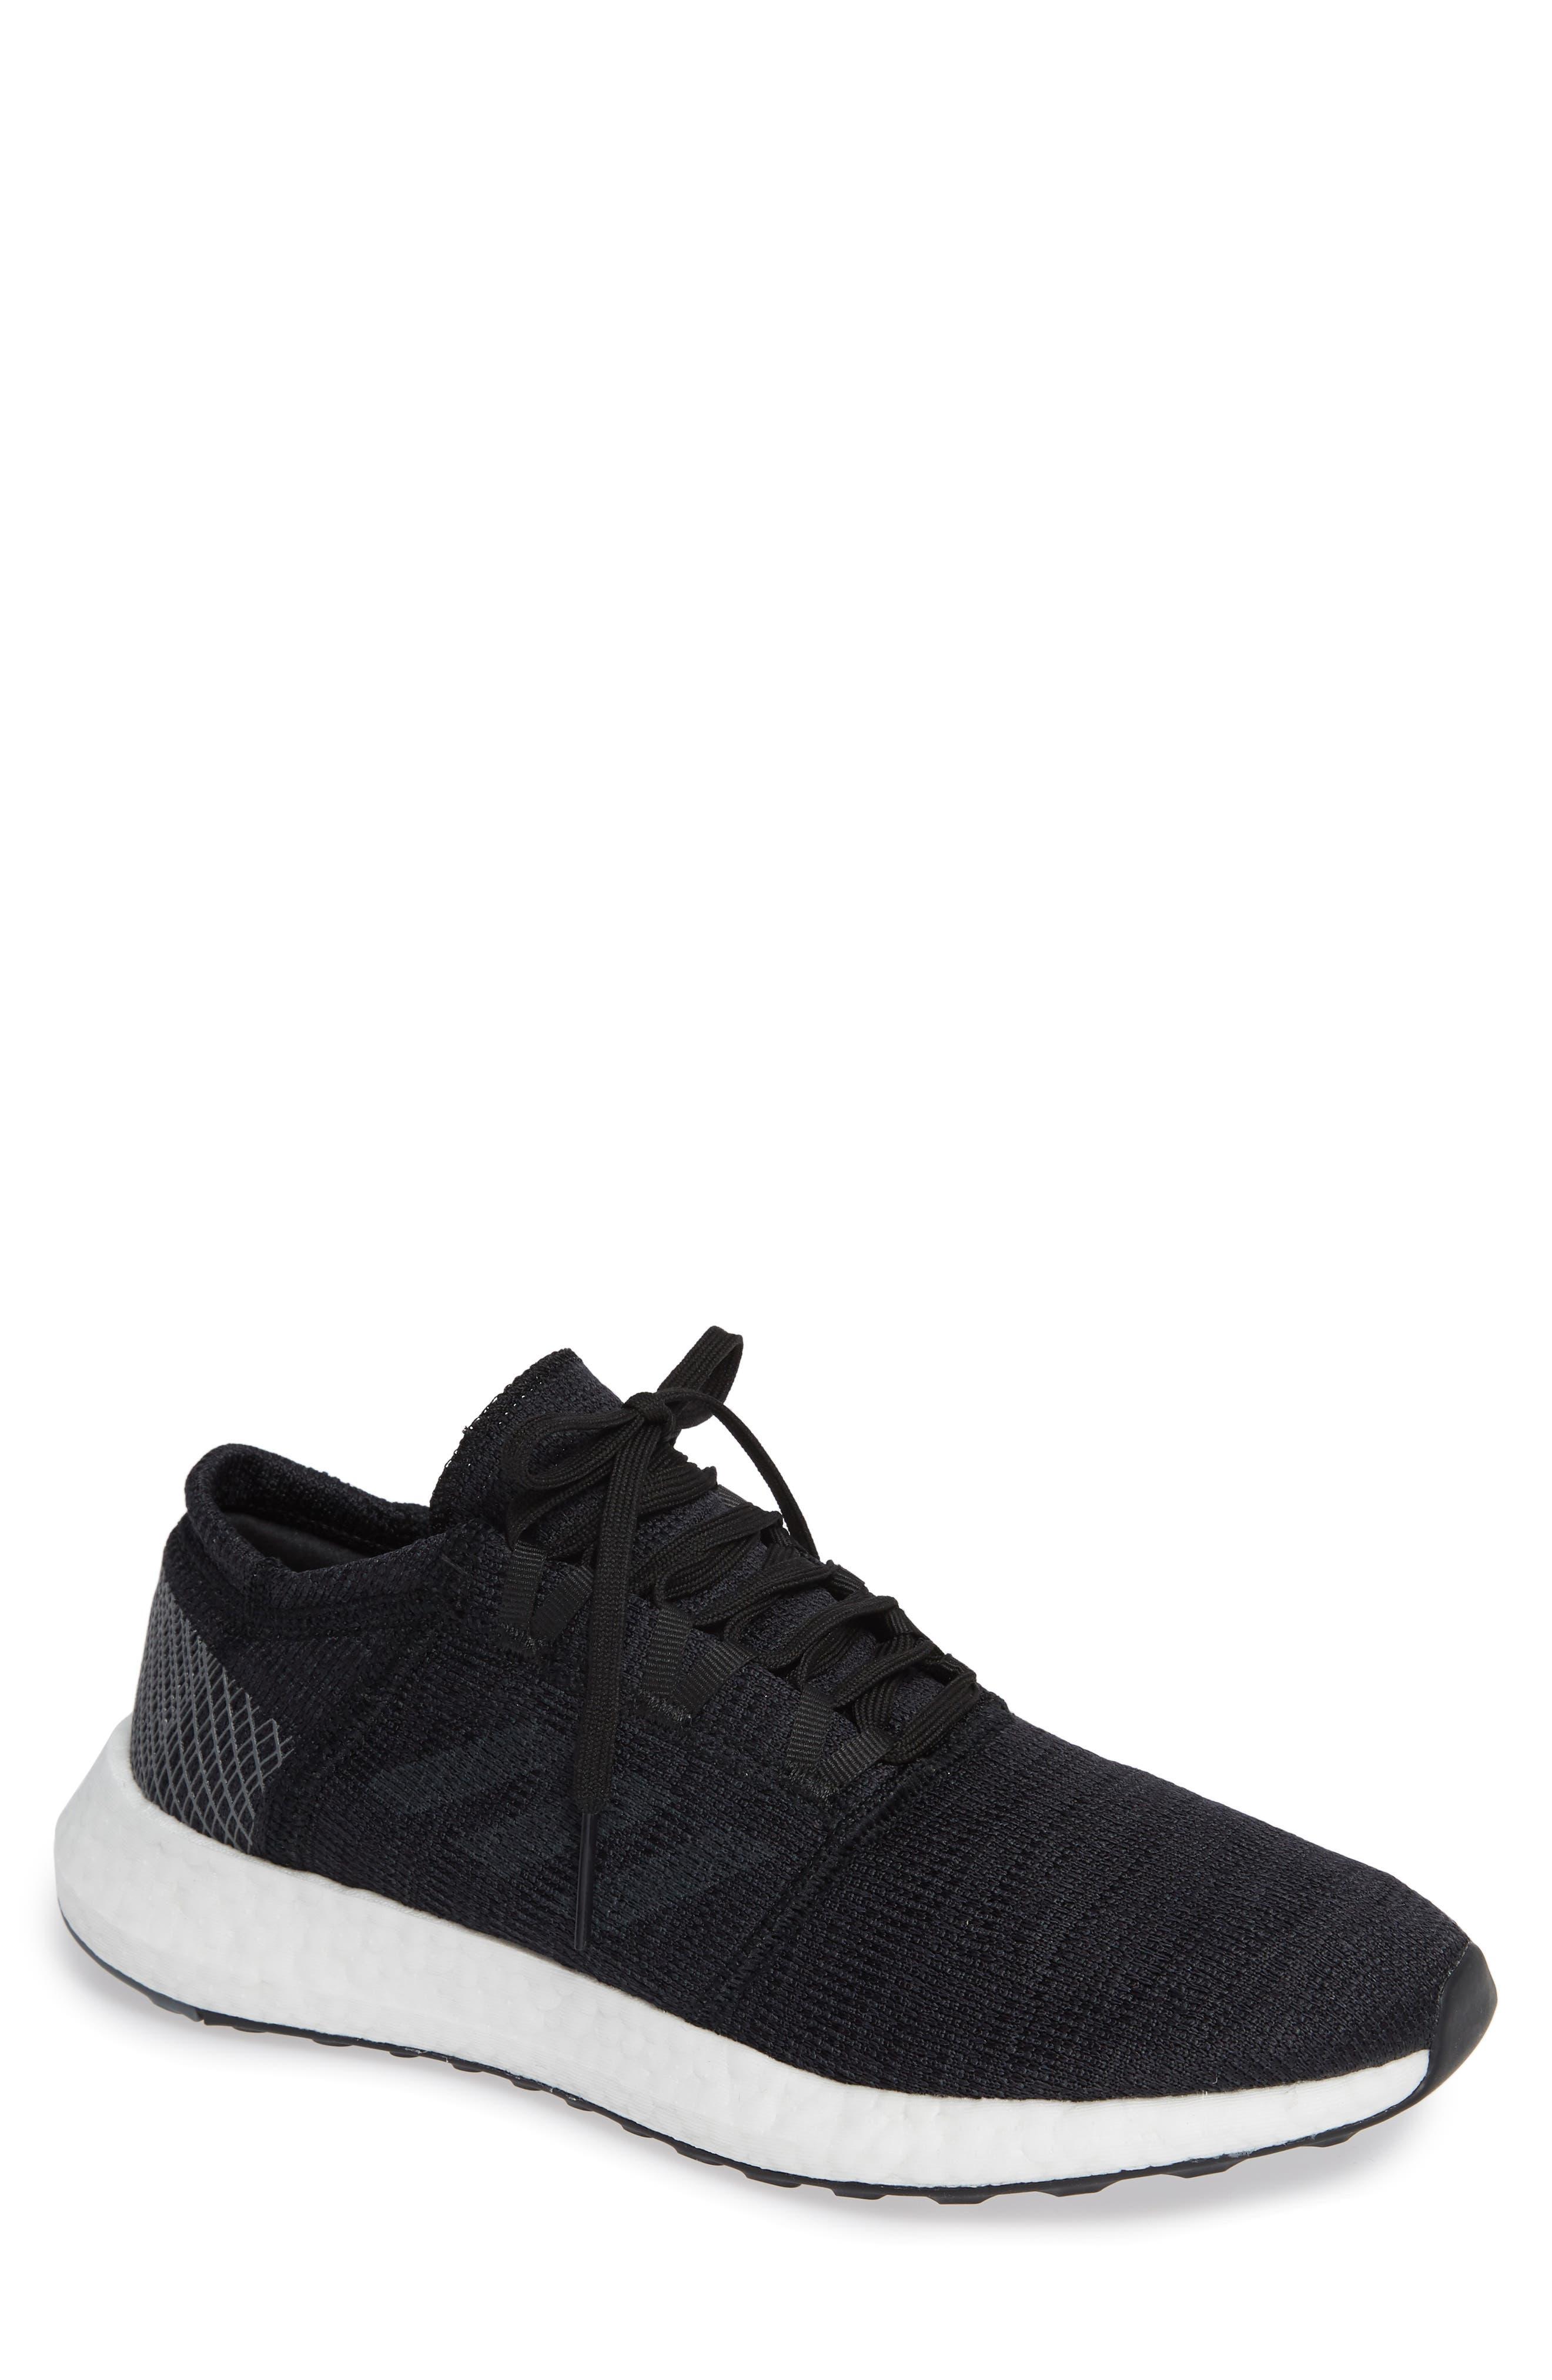 PureBoost GO Running Shoe,                         Main,                         color, BLACK/ GREY